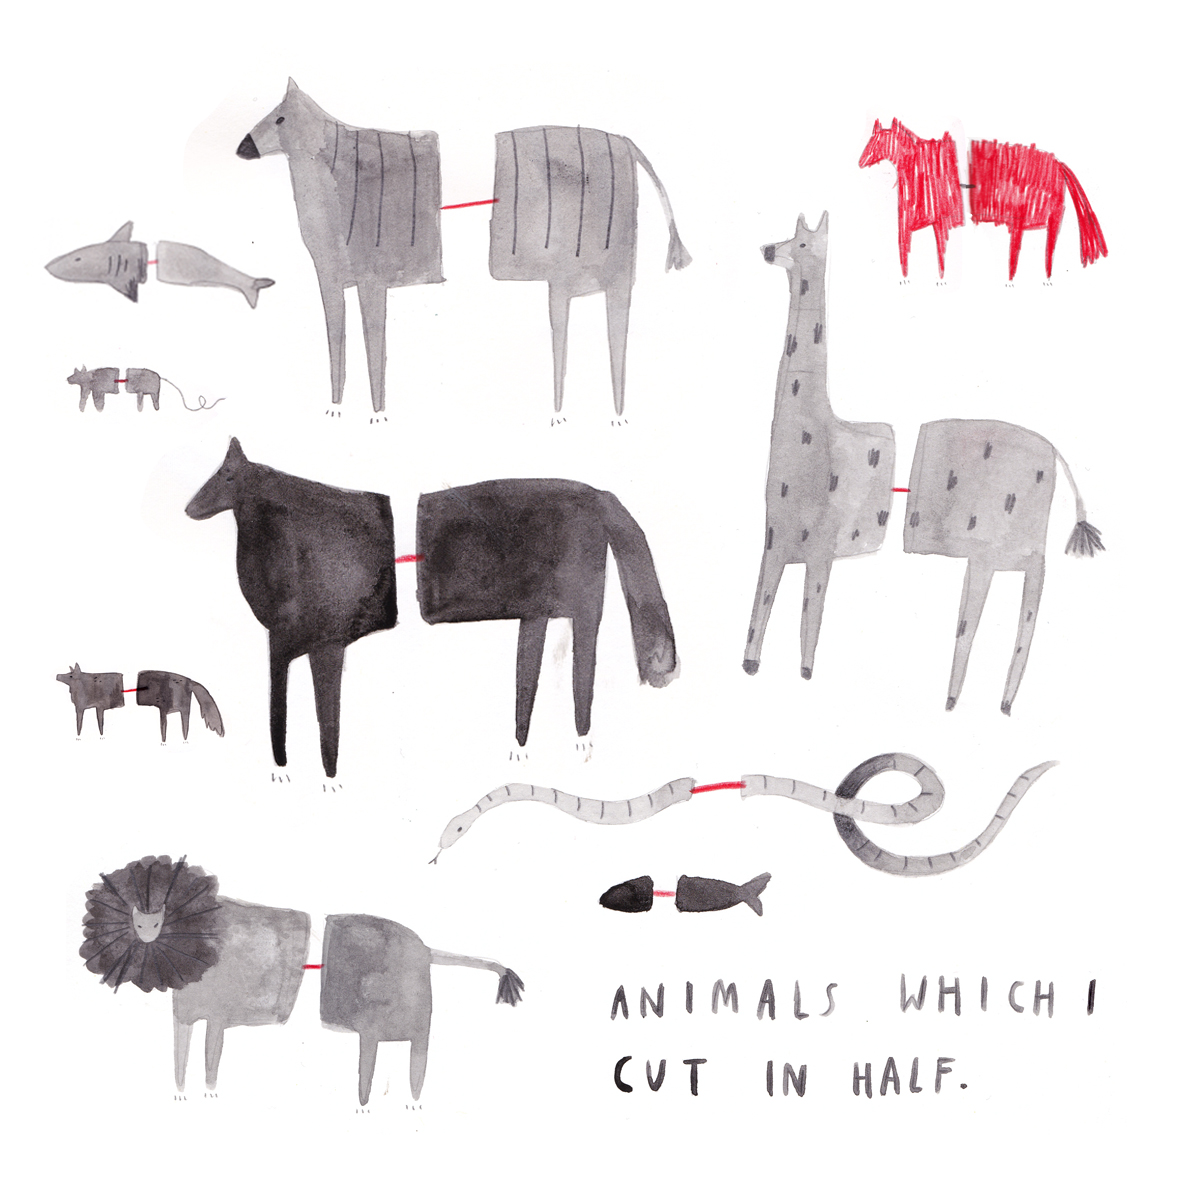 animalswhichicutinhalf.jpg